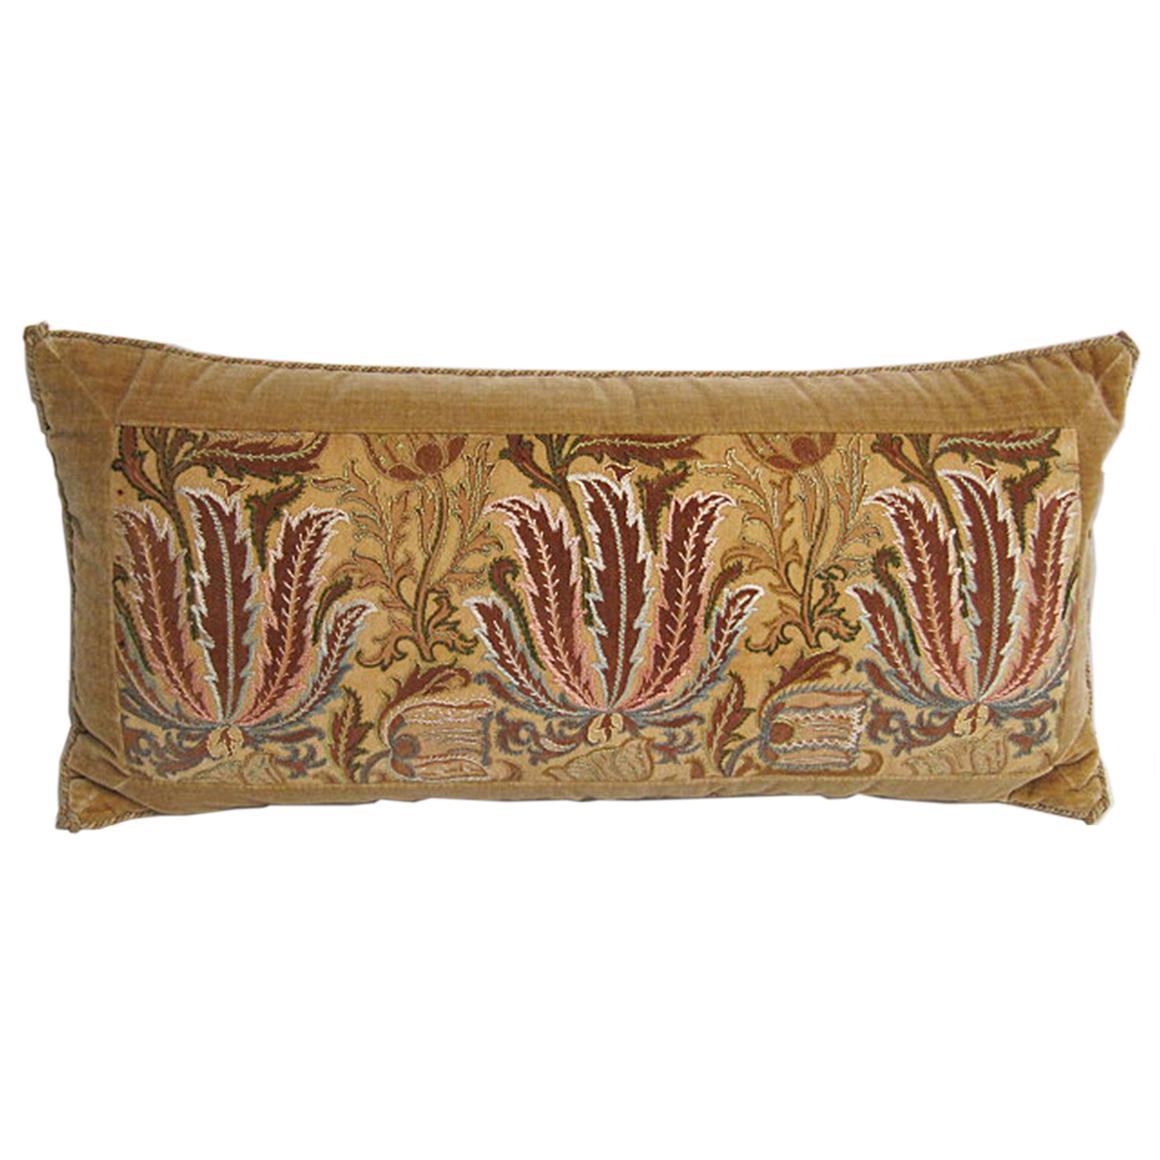 Satin Pillowcase Dublin: Handmade Yellow Velvet Pillow With 19th Century